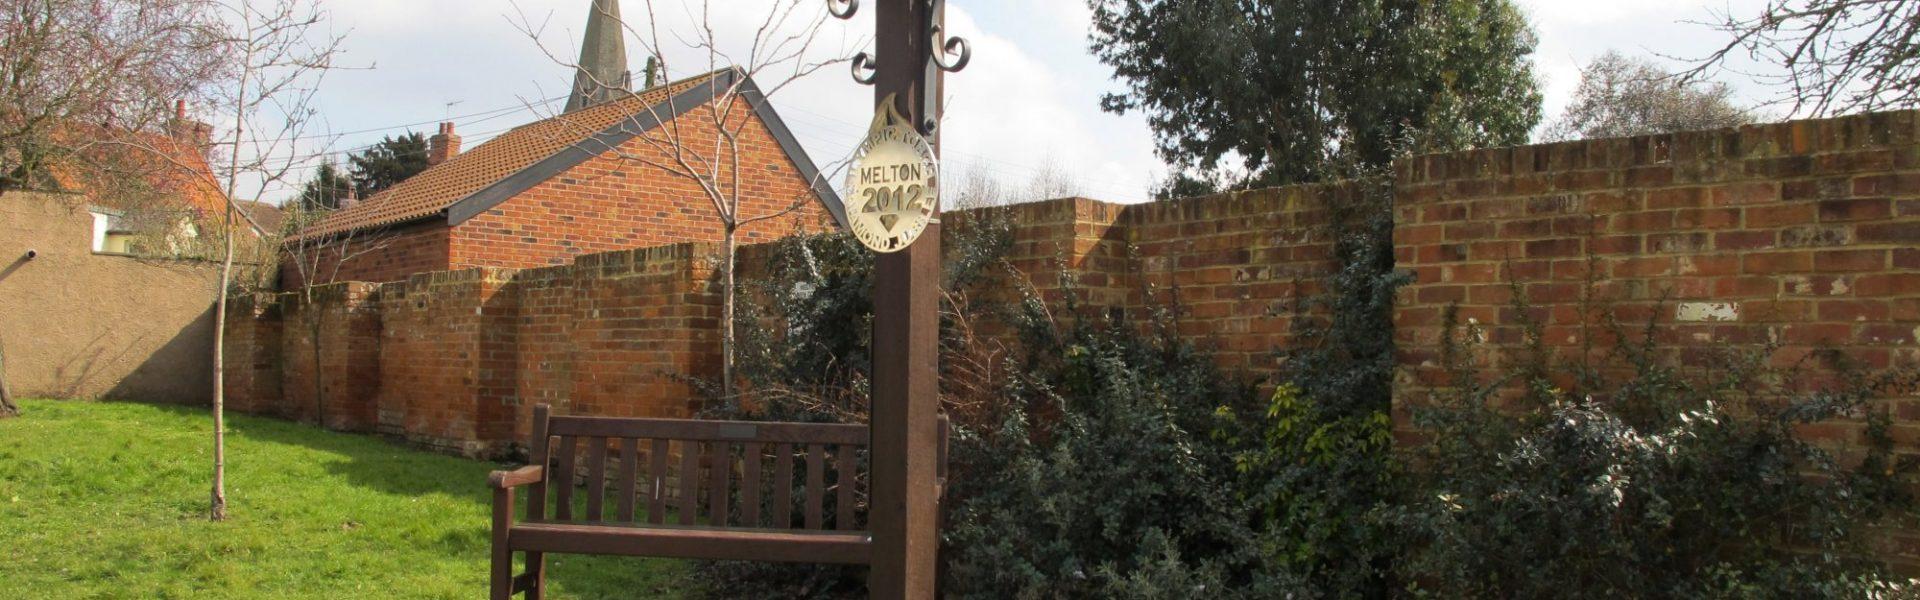 The Melton village sign